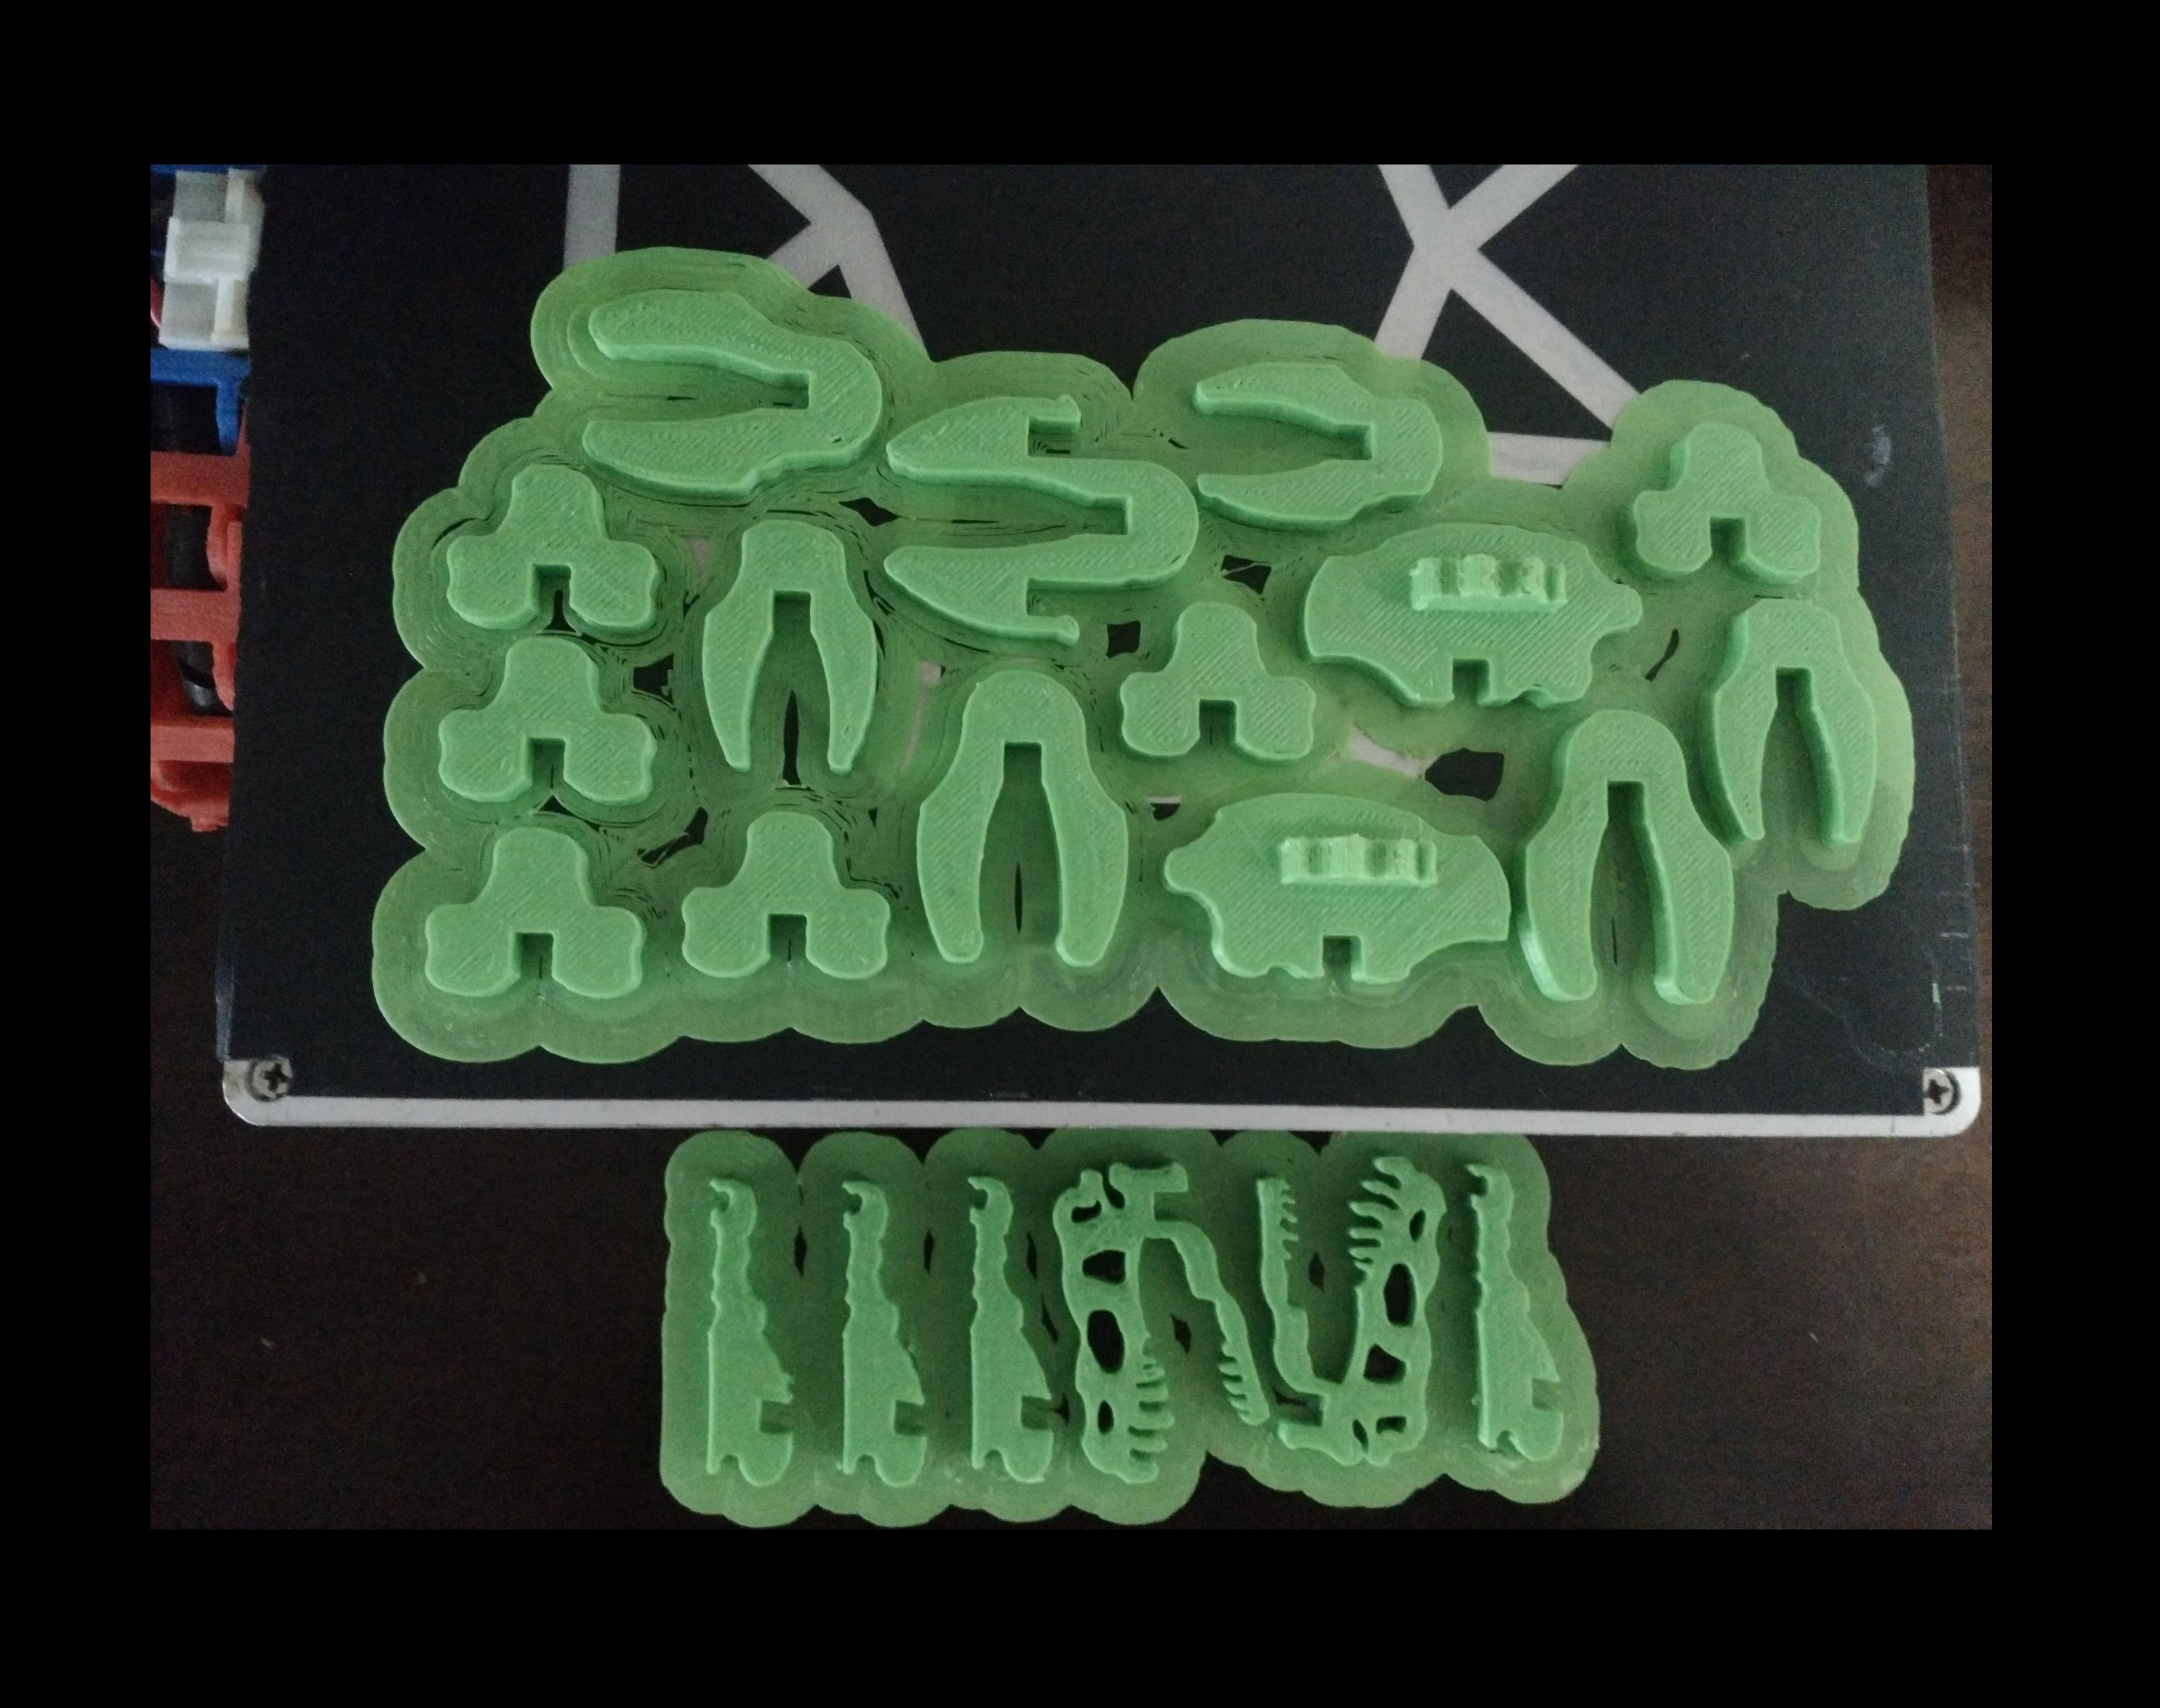 15378224178822.jpg Download free STL file Dinosaur Skel for 3D Printer! - Terry the Dinosaur! • 3D printer model, _aalejandrovr24